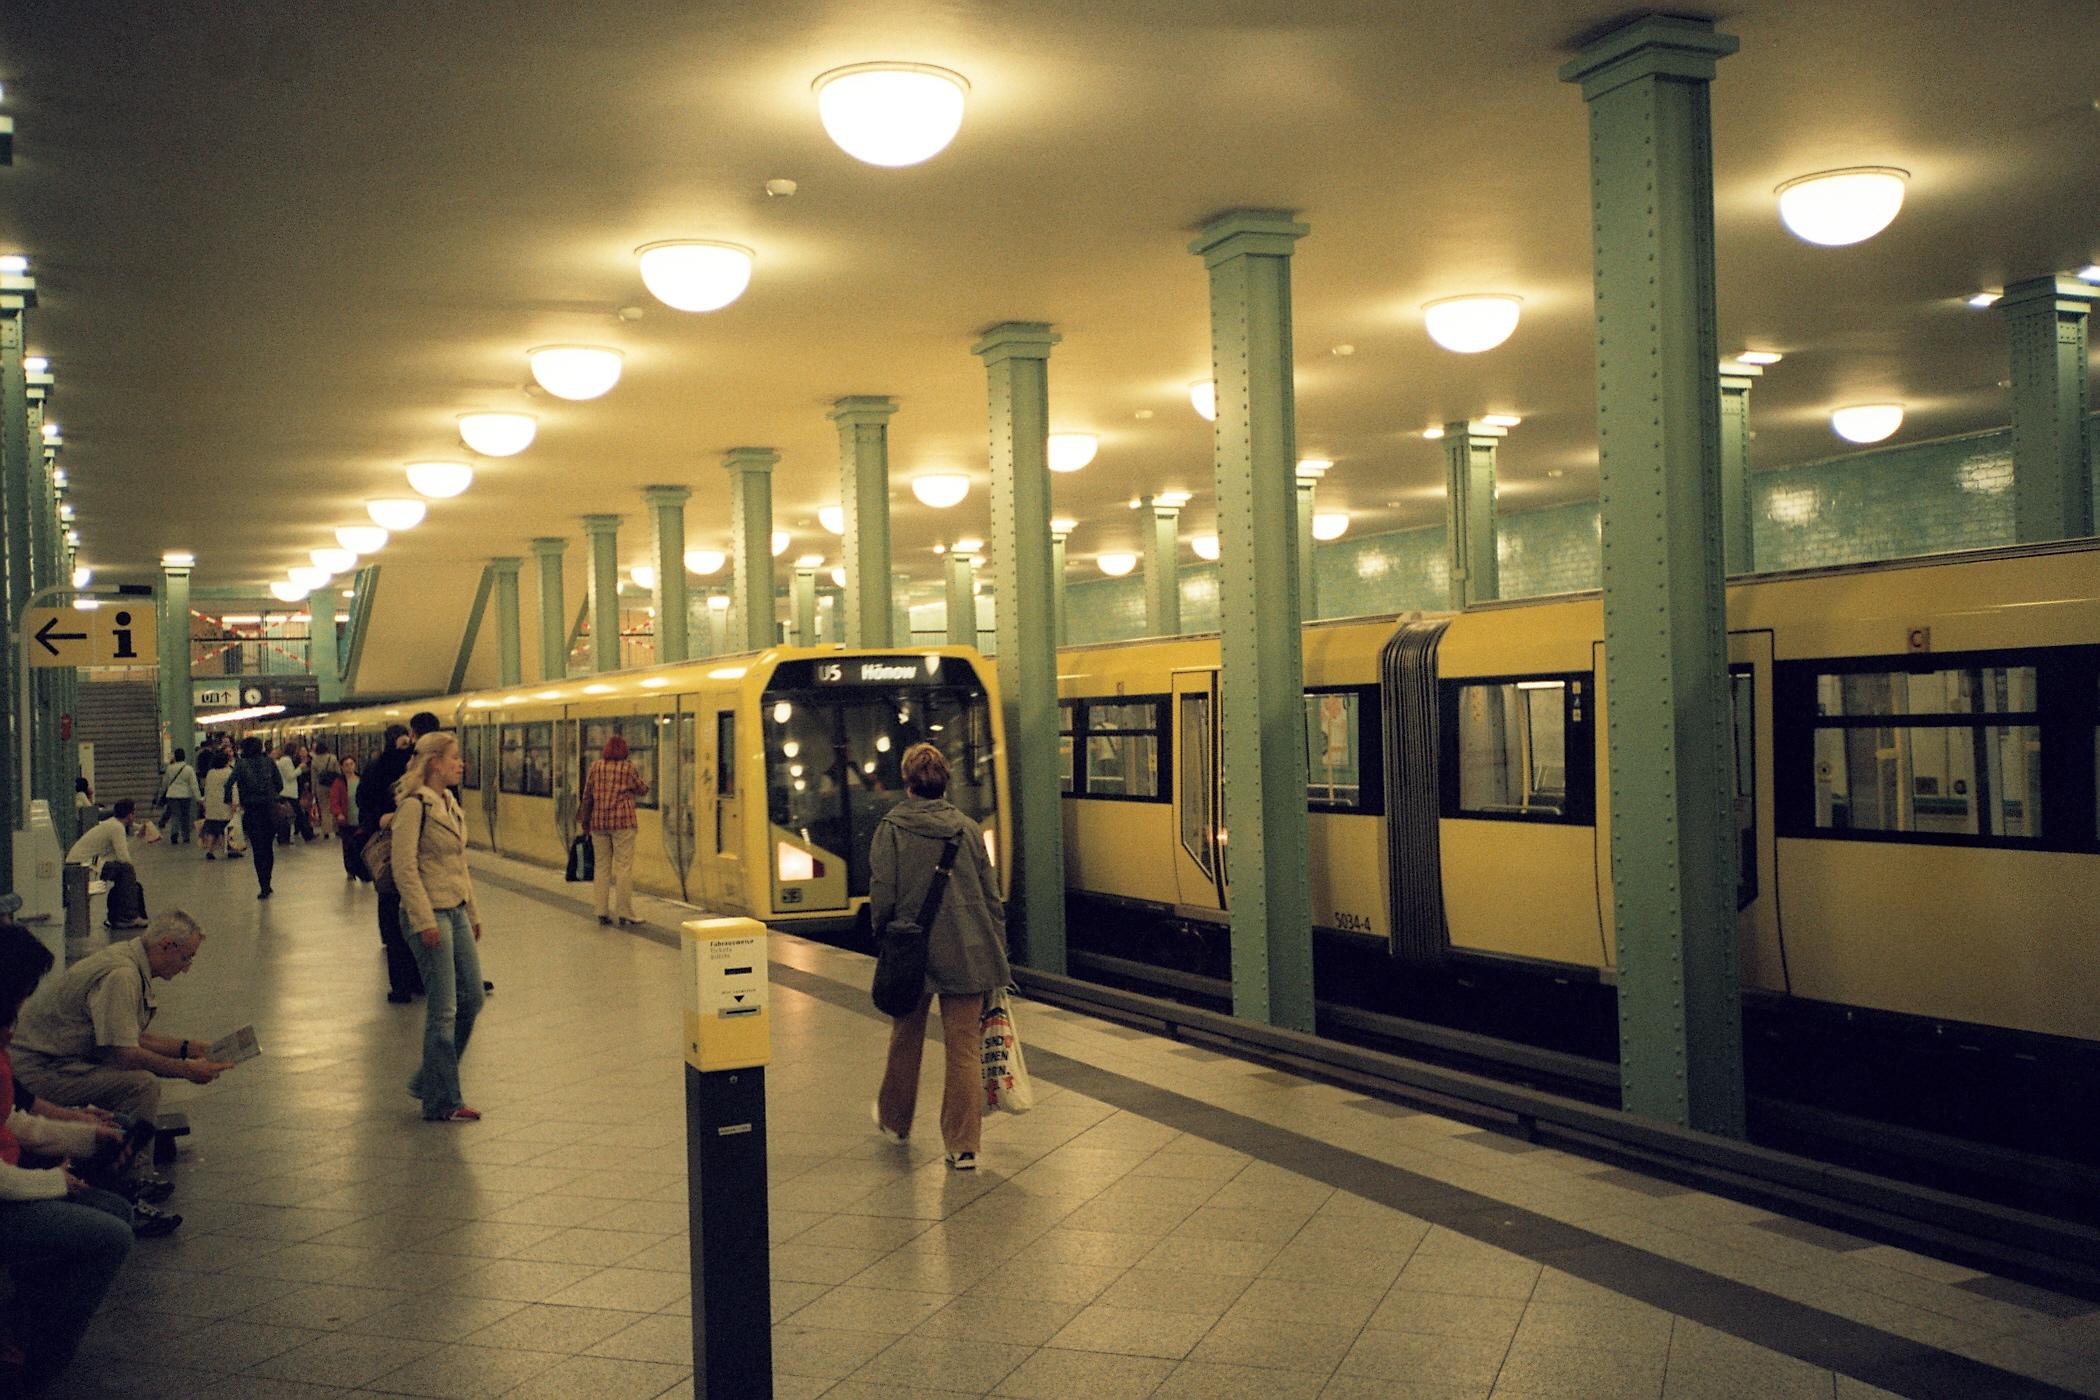 u bahnhof alexanderplatz rome - photo#19